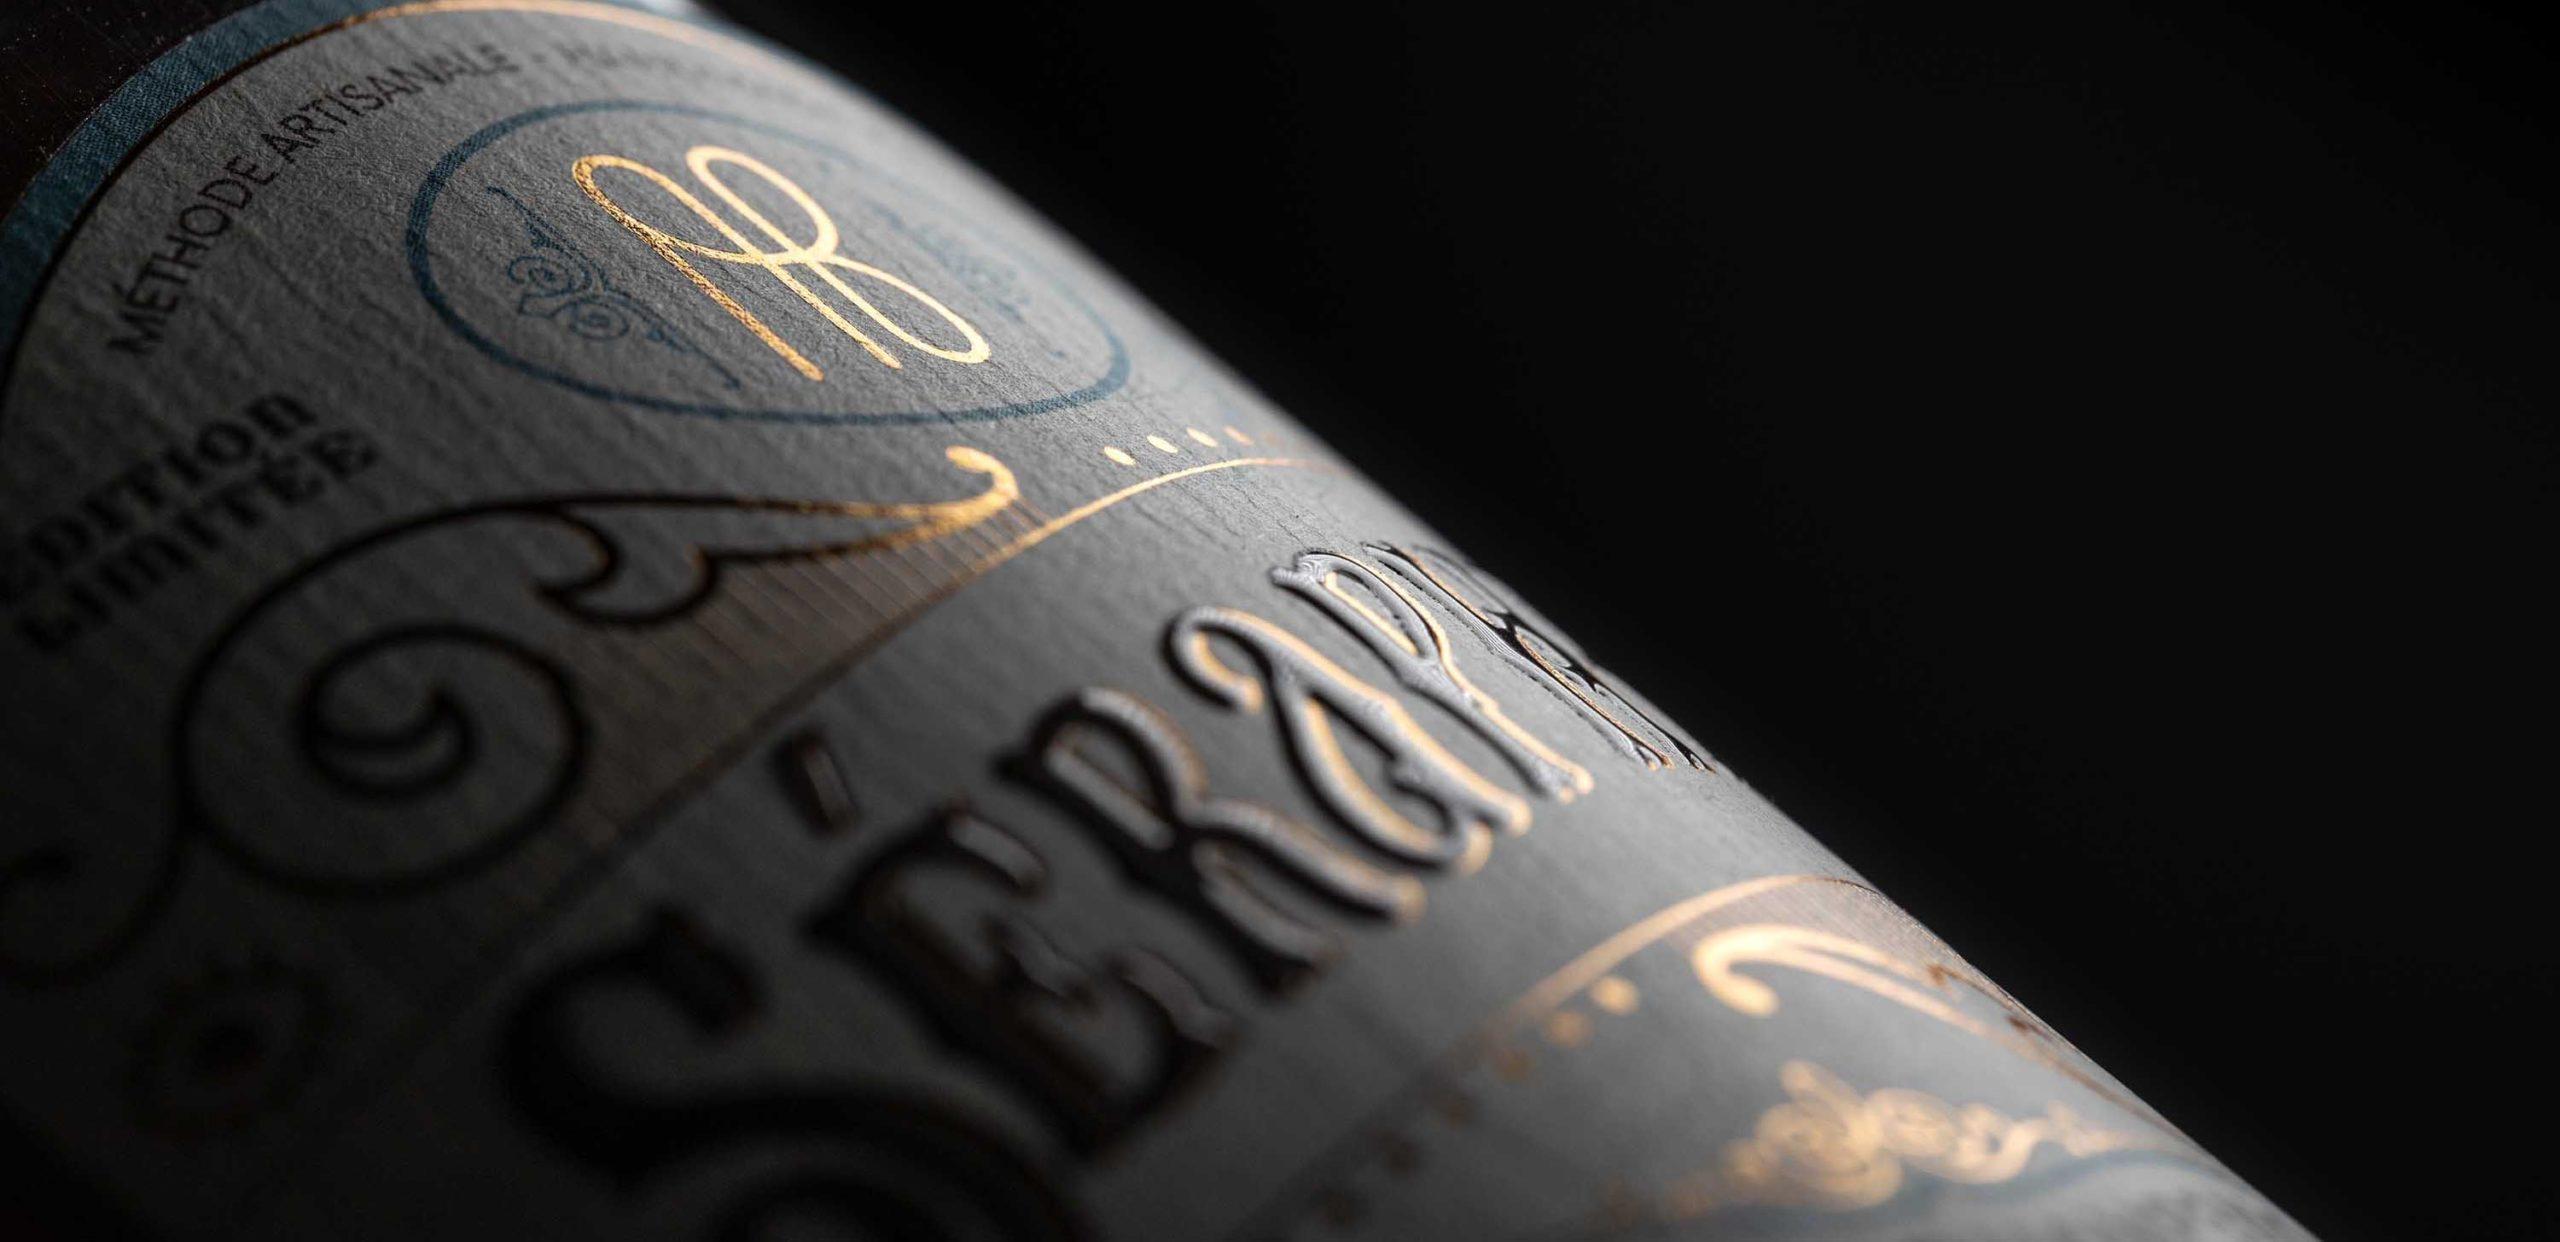 Ratafia Champenois Champagne Allouchery Bailly - Agence Discovery